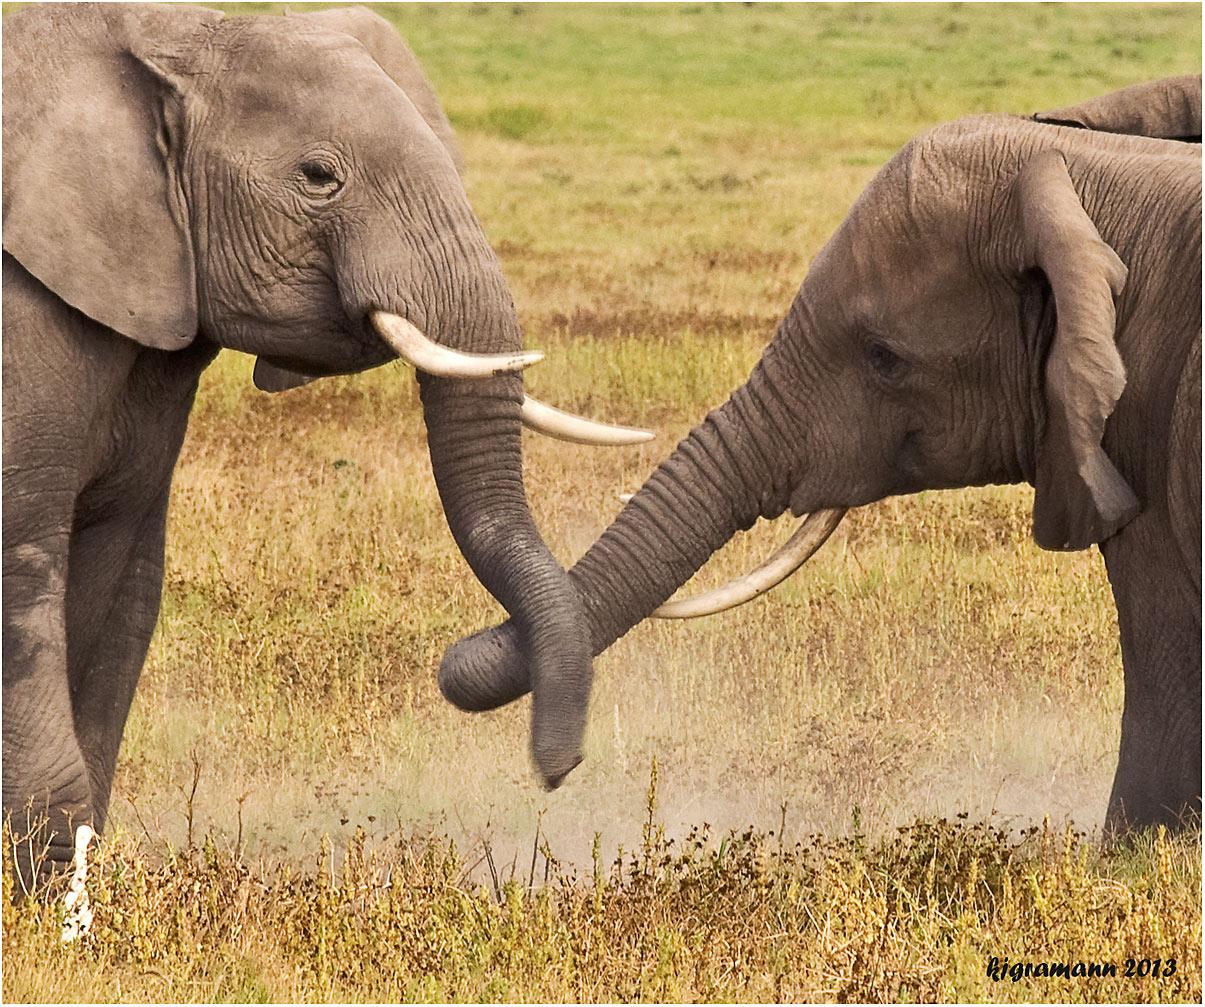 Komm Lass Uns Wieder Vertragen Foto Bild Africa Eastern